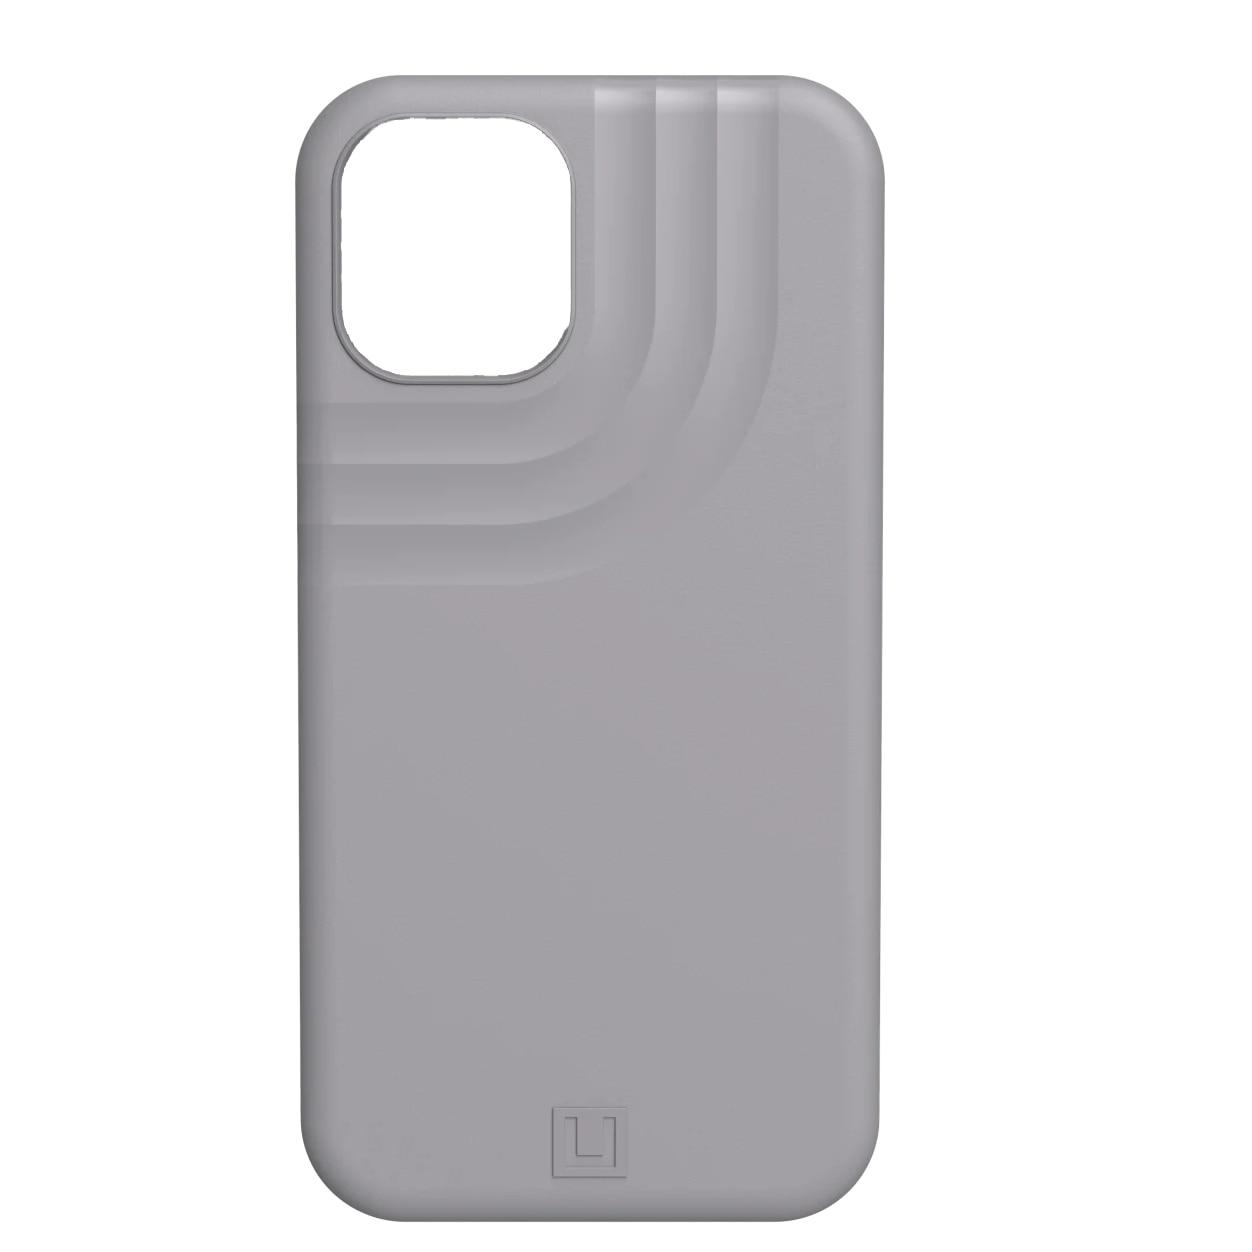 Fotografie Husa de protectie Anchor iPhone 12 Mini, Light Gray